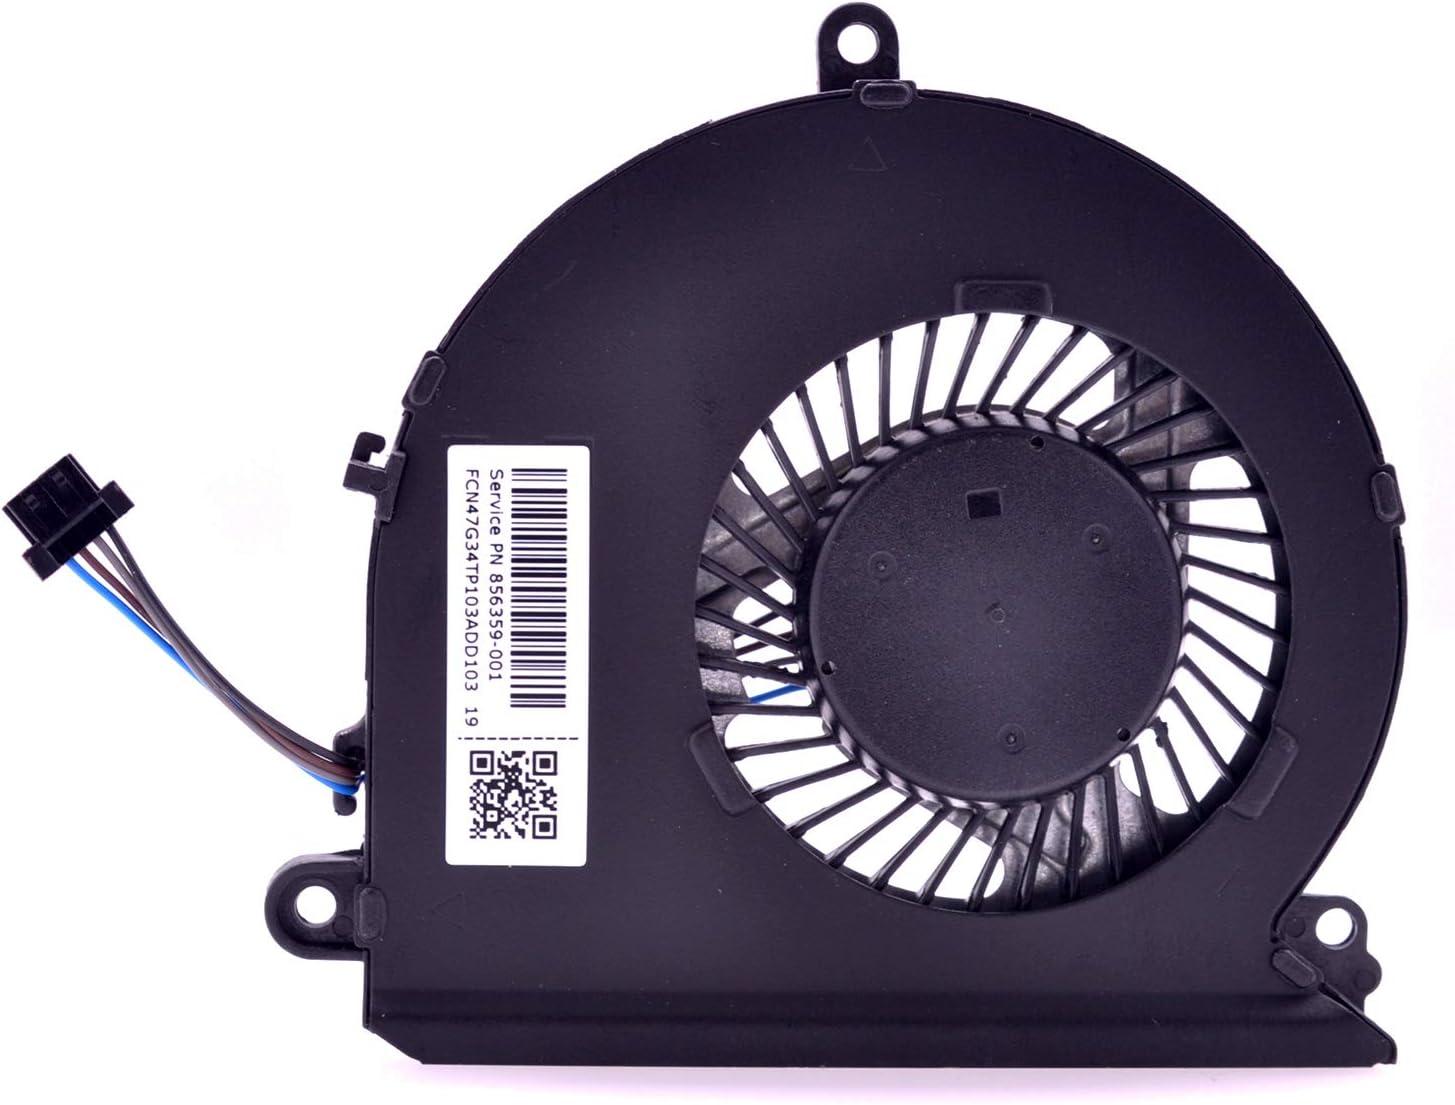 PartEGG CPU Cooling Fan Replacement for HP Pavilion 15-AU 15AU 15-AW 15T-AU 15Z-AW 15-AW000 15-AU000NR 856359-001